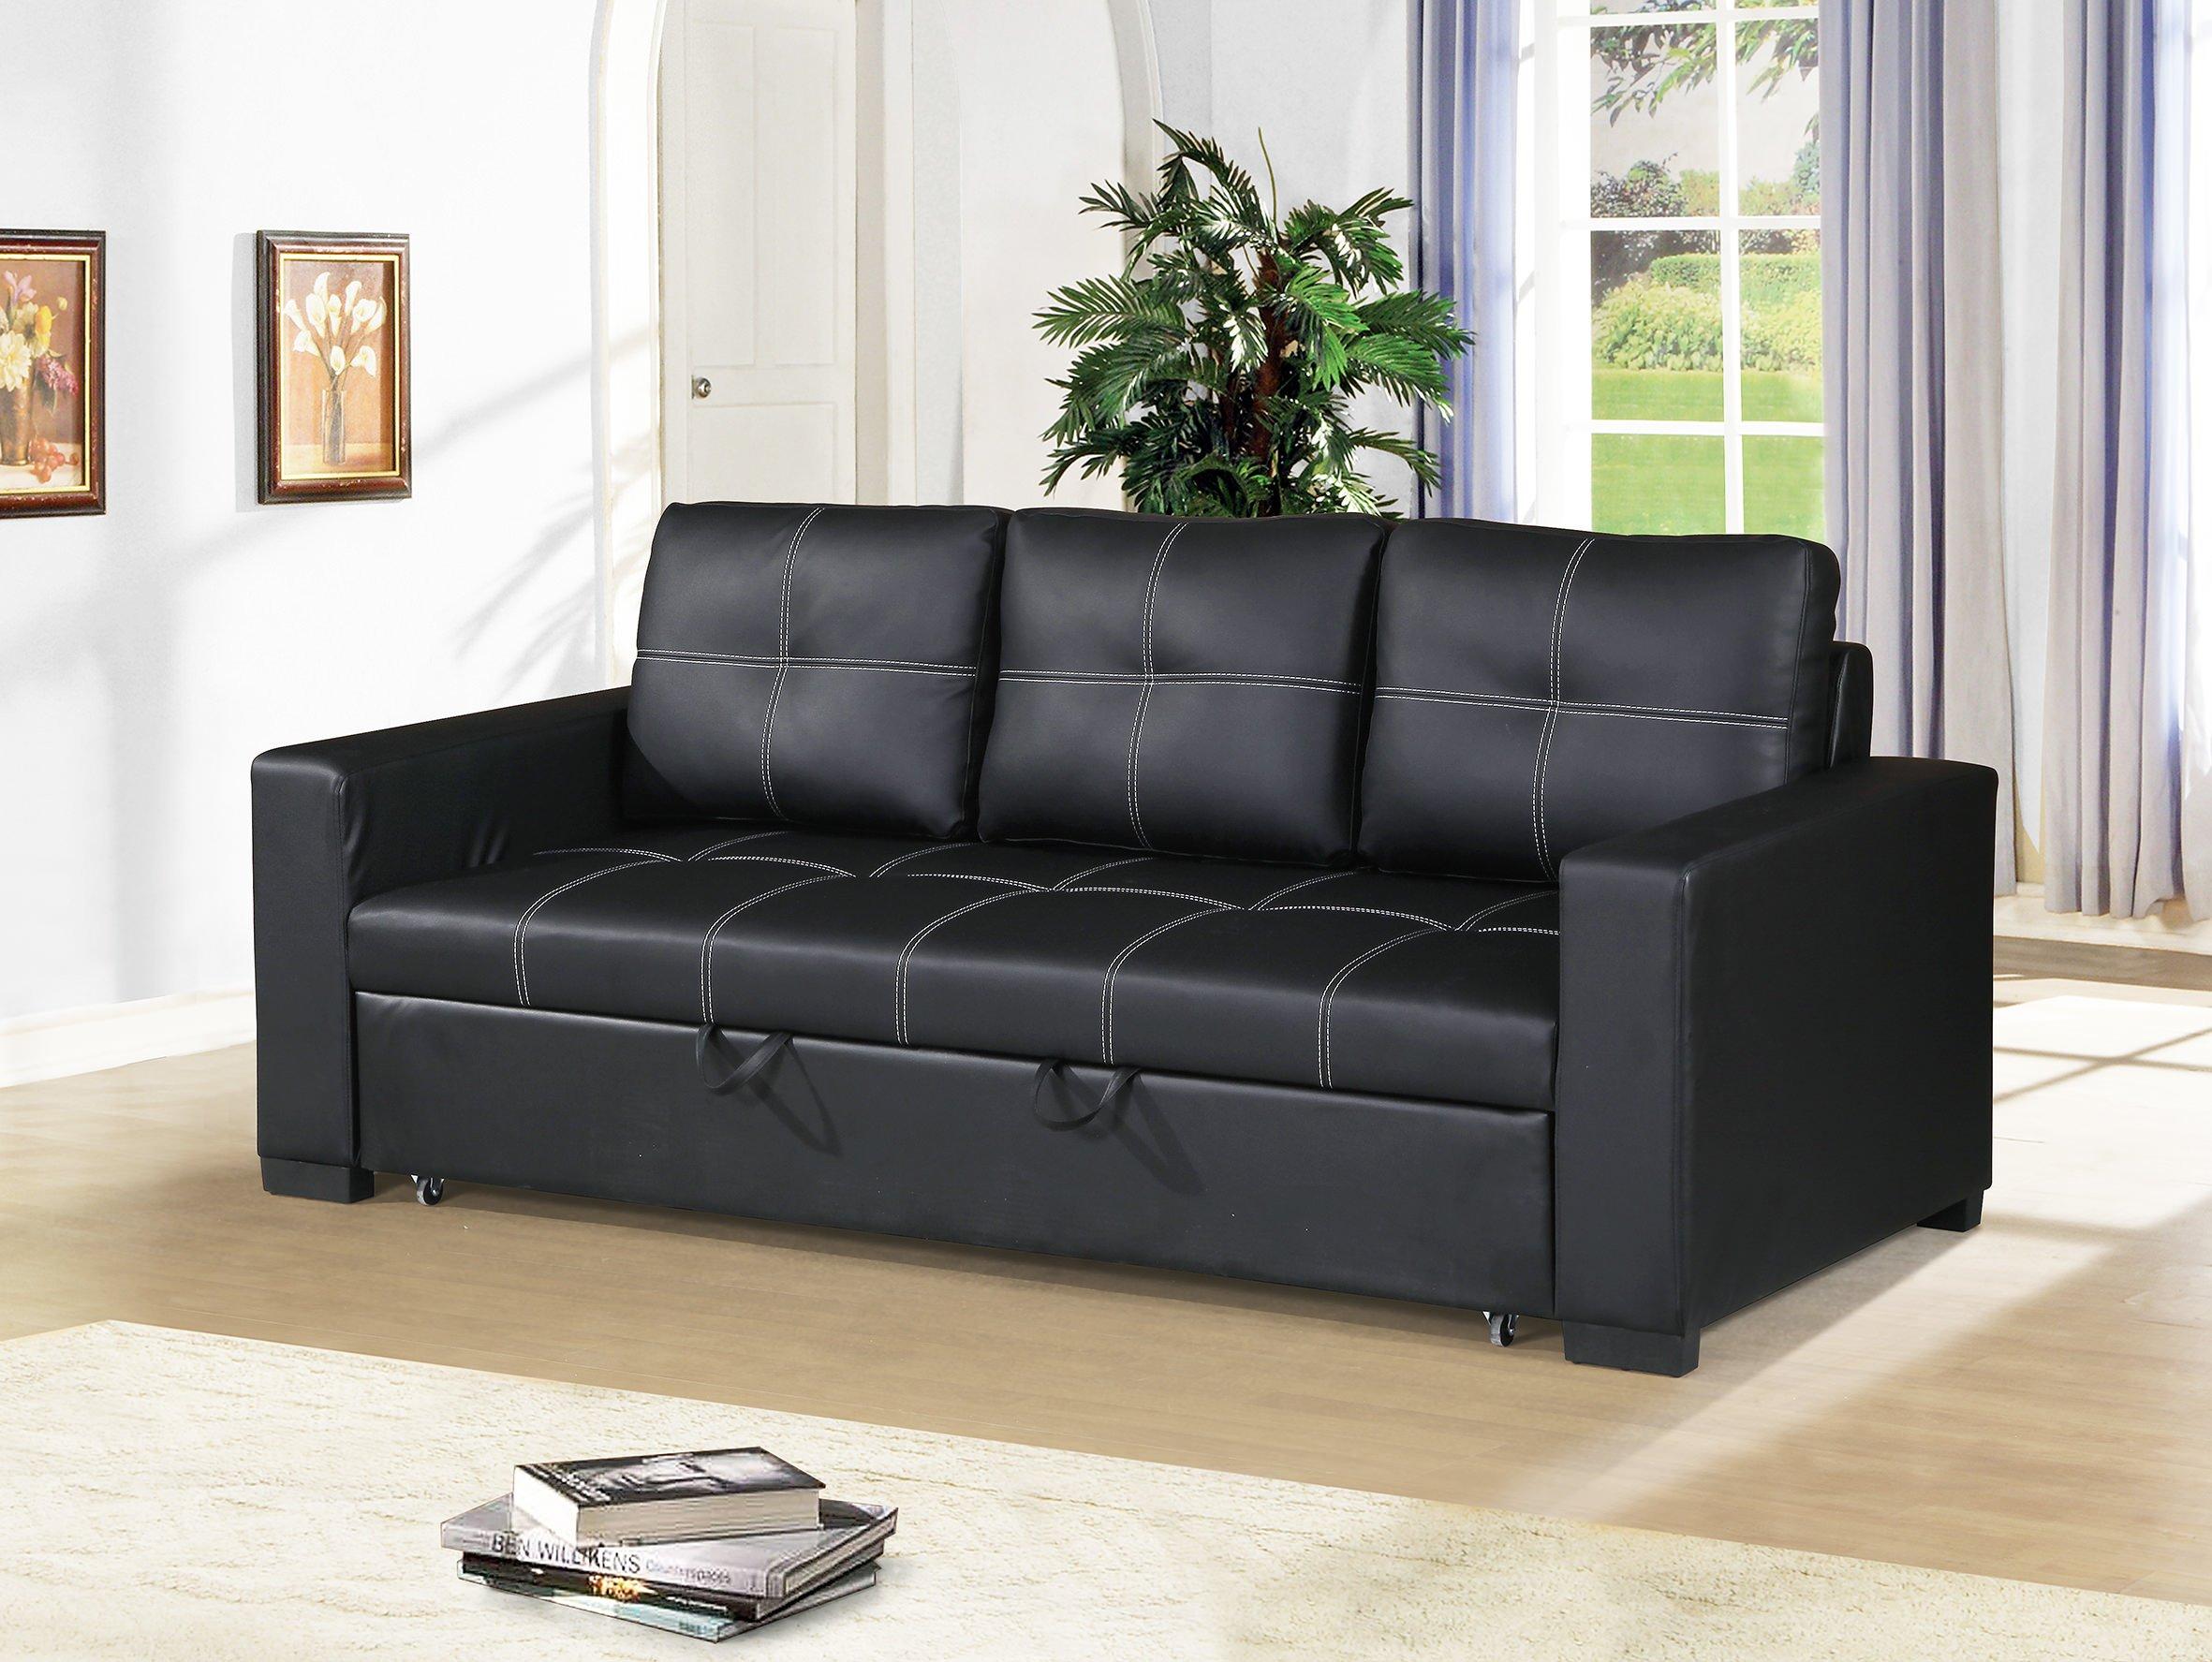 Black Convertible Sofa Serta Morgan Convertible Sofa Black